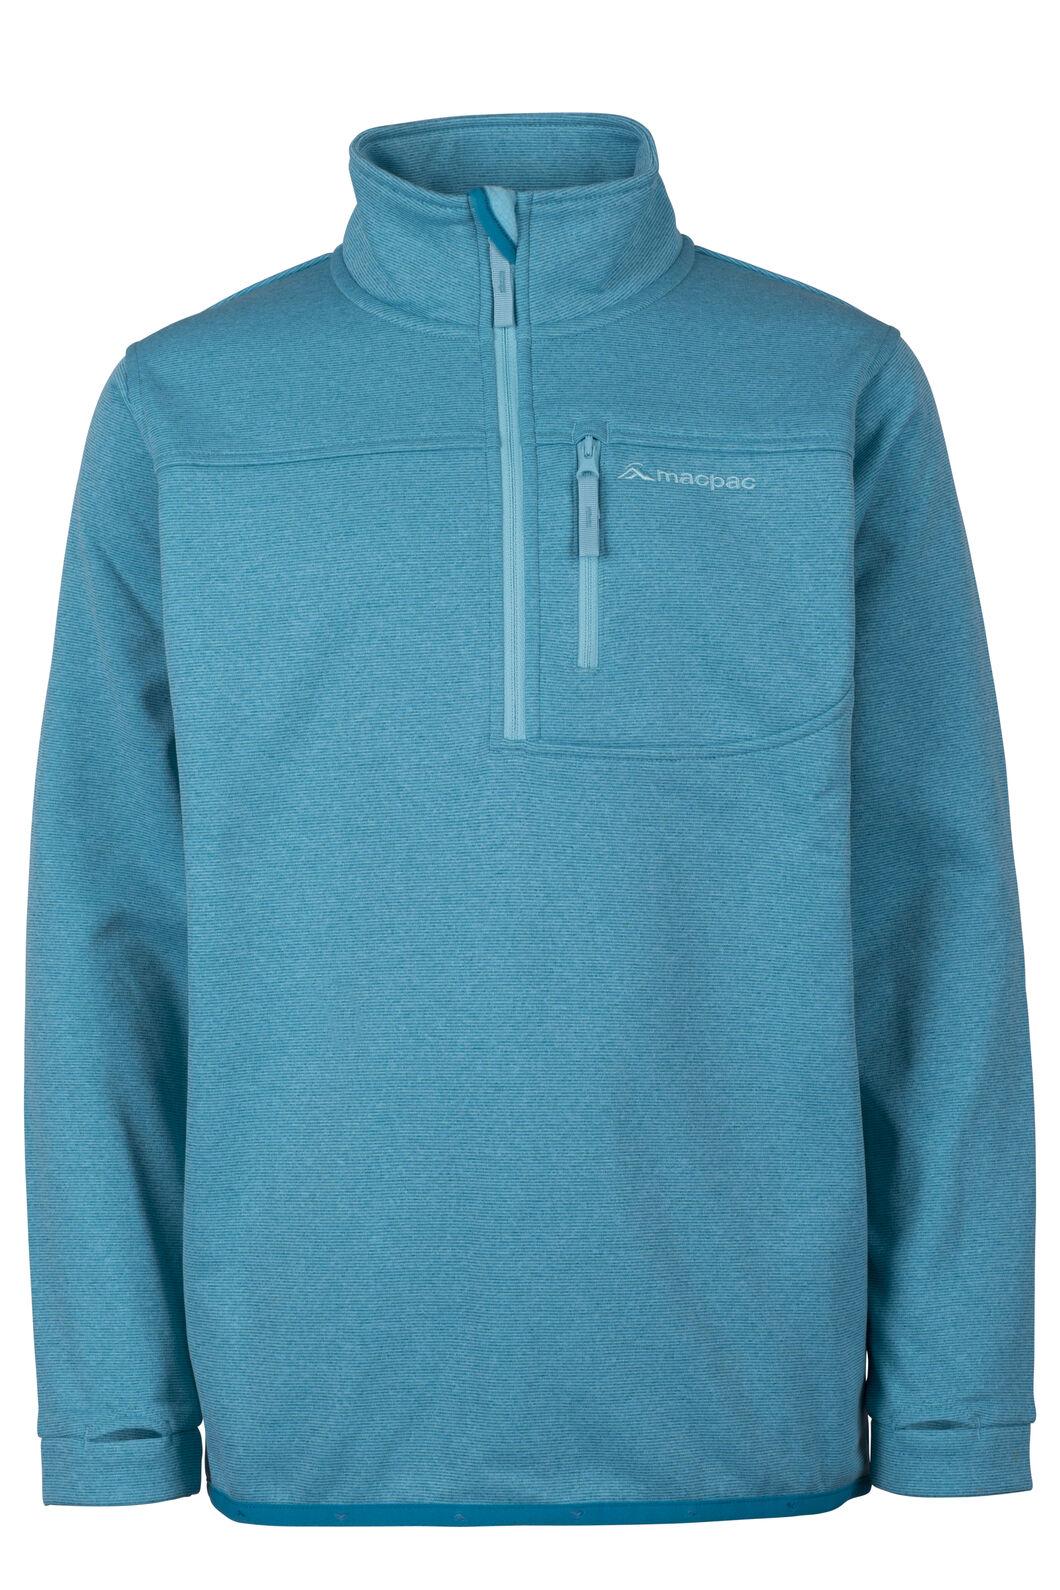 Macpac Kiwi Fleece Pullover - Kids', Enamel Blue, hi-res